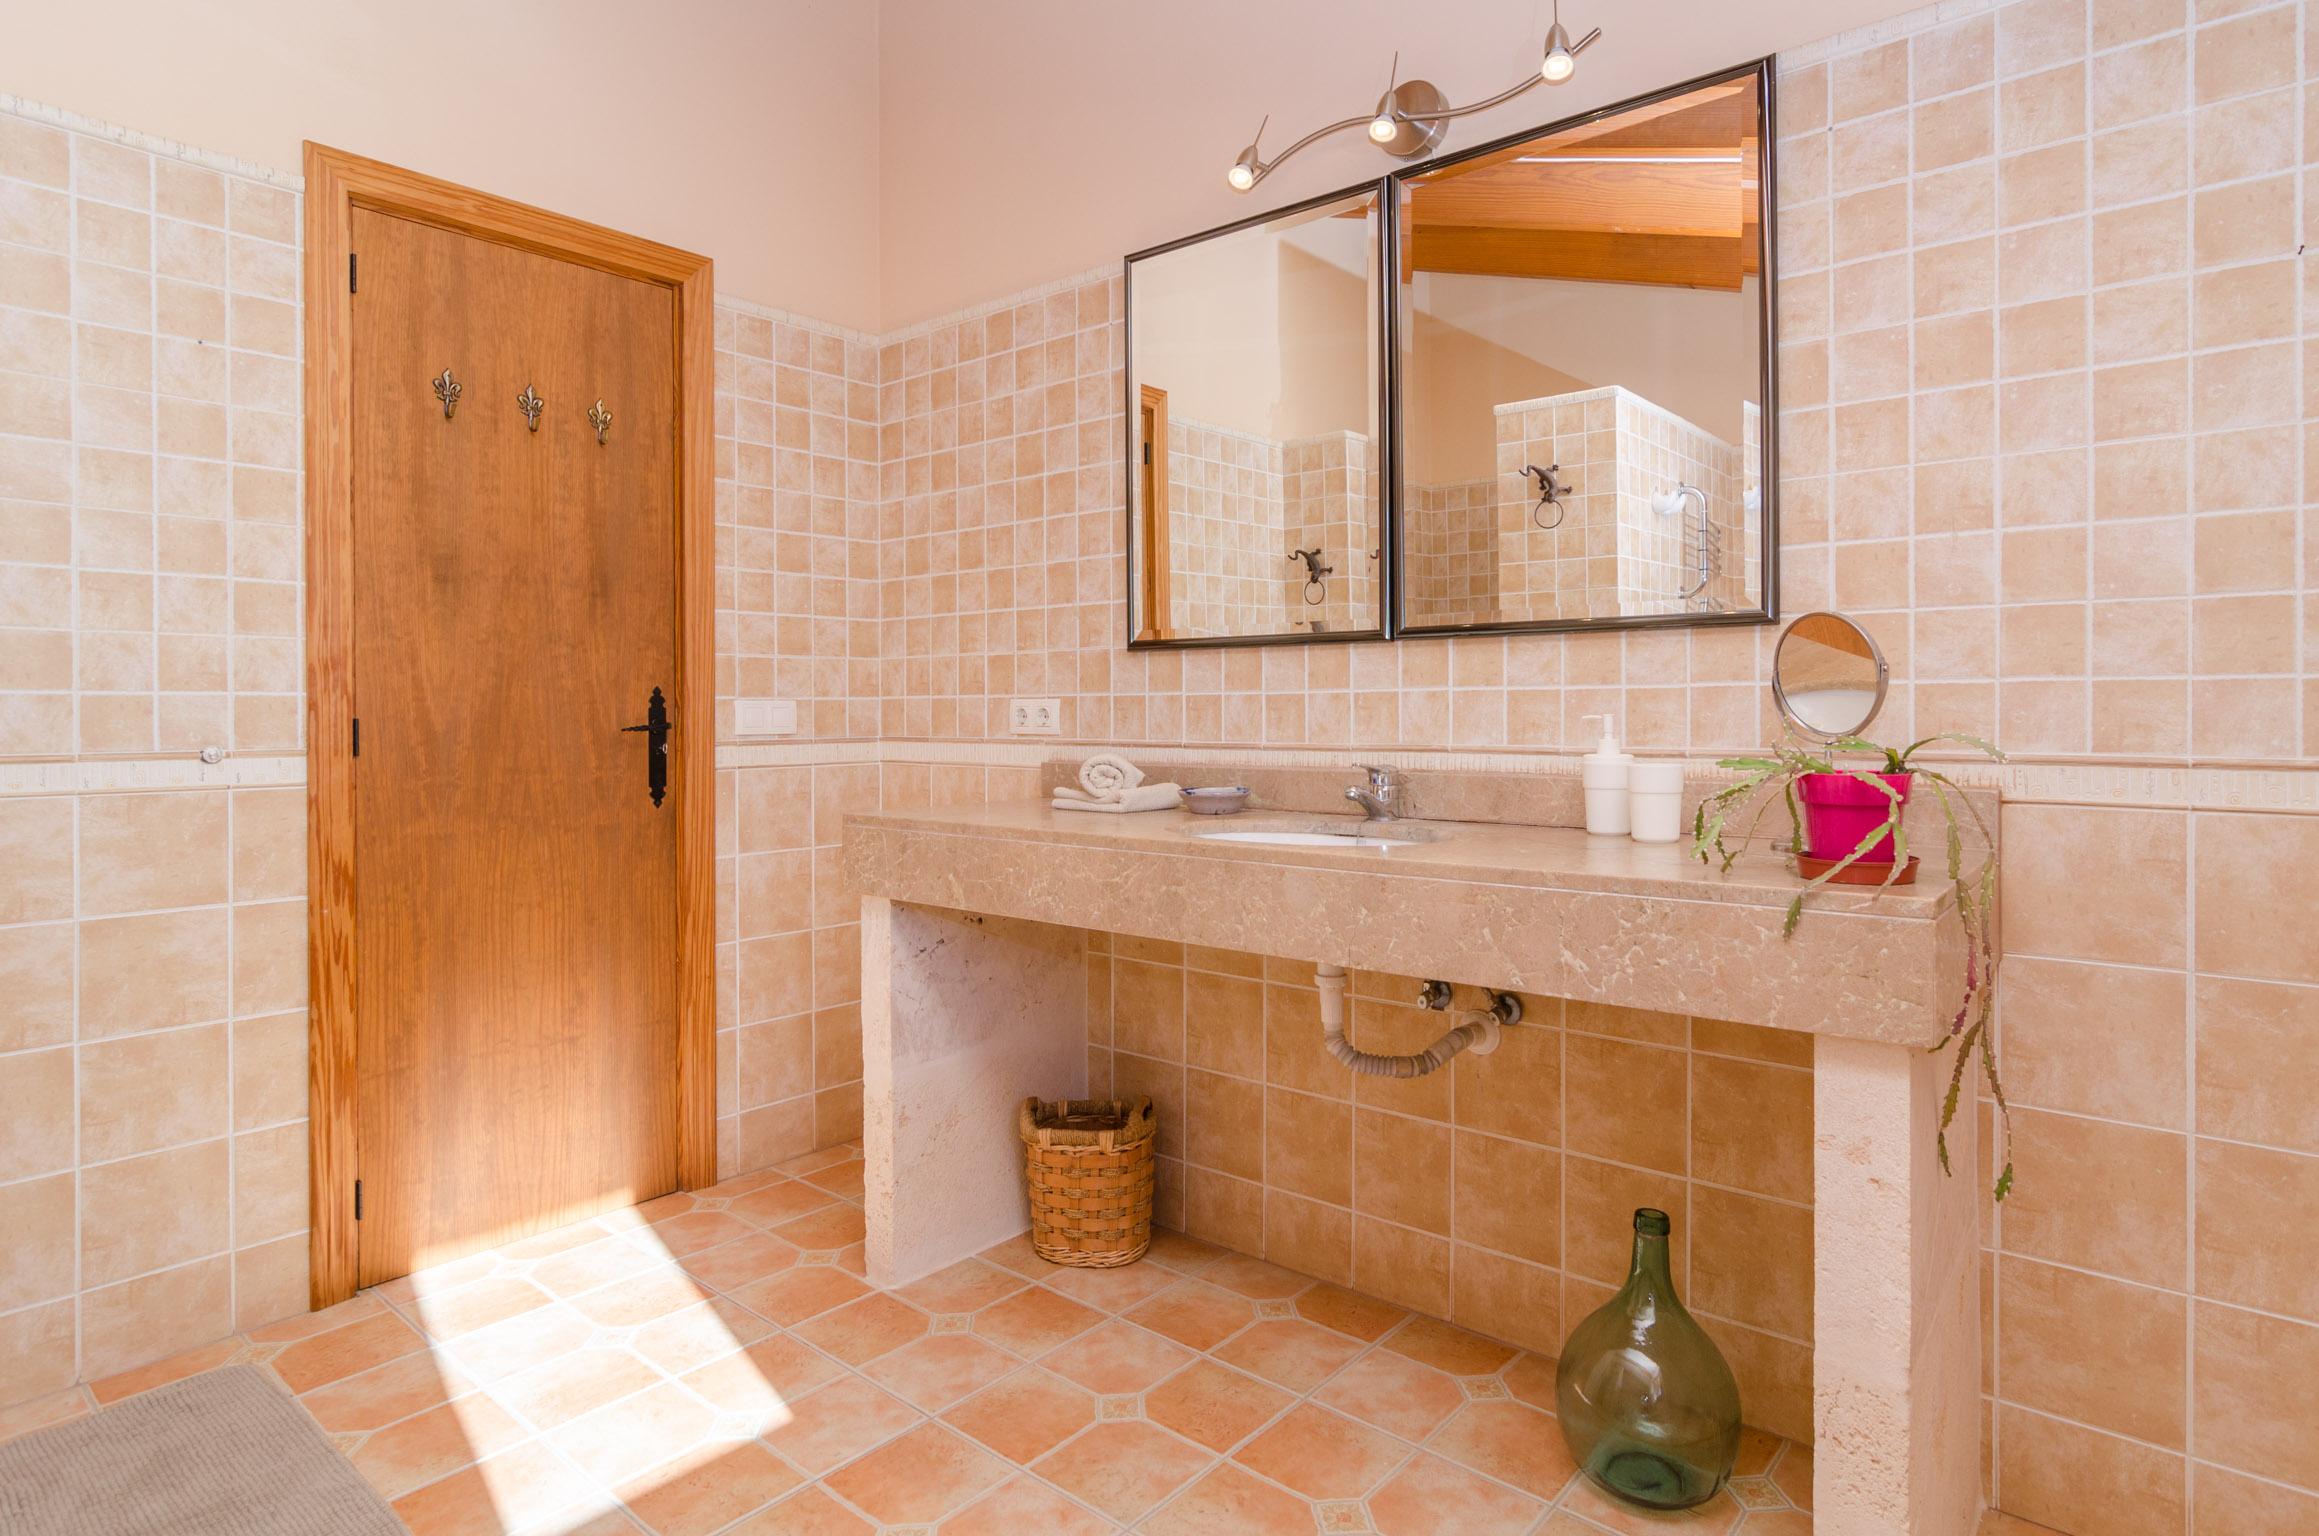 Ferienhaus SANT BLAI VELL (2284789), Campos, Mallorca, Balearische Inseln, Spanien, Bild 22